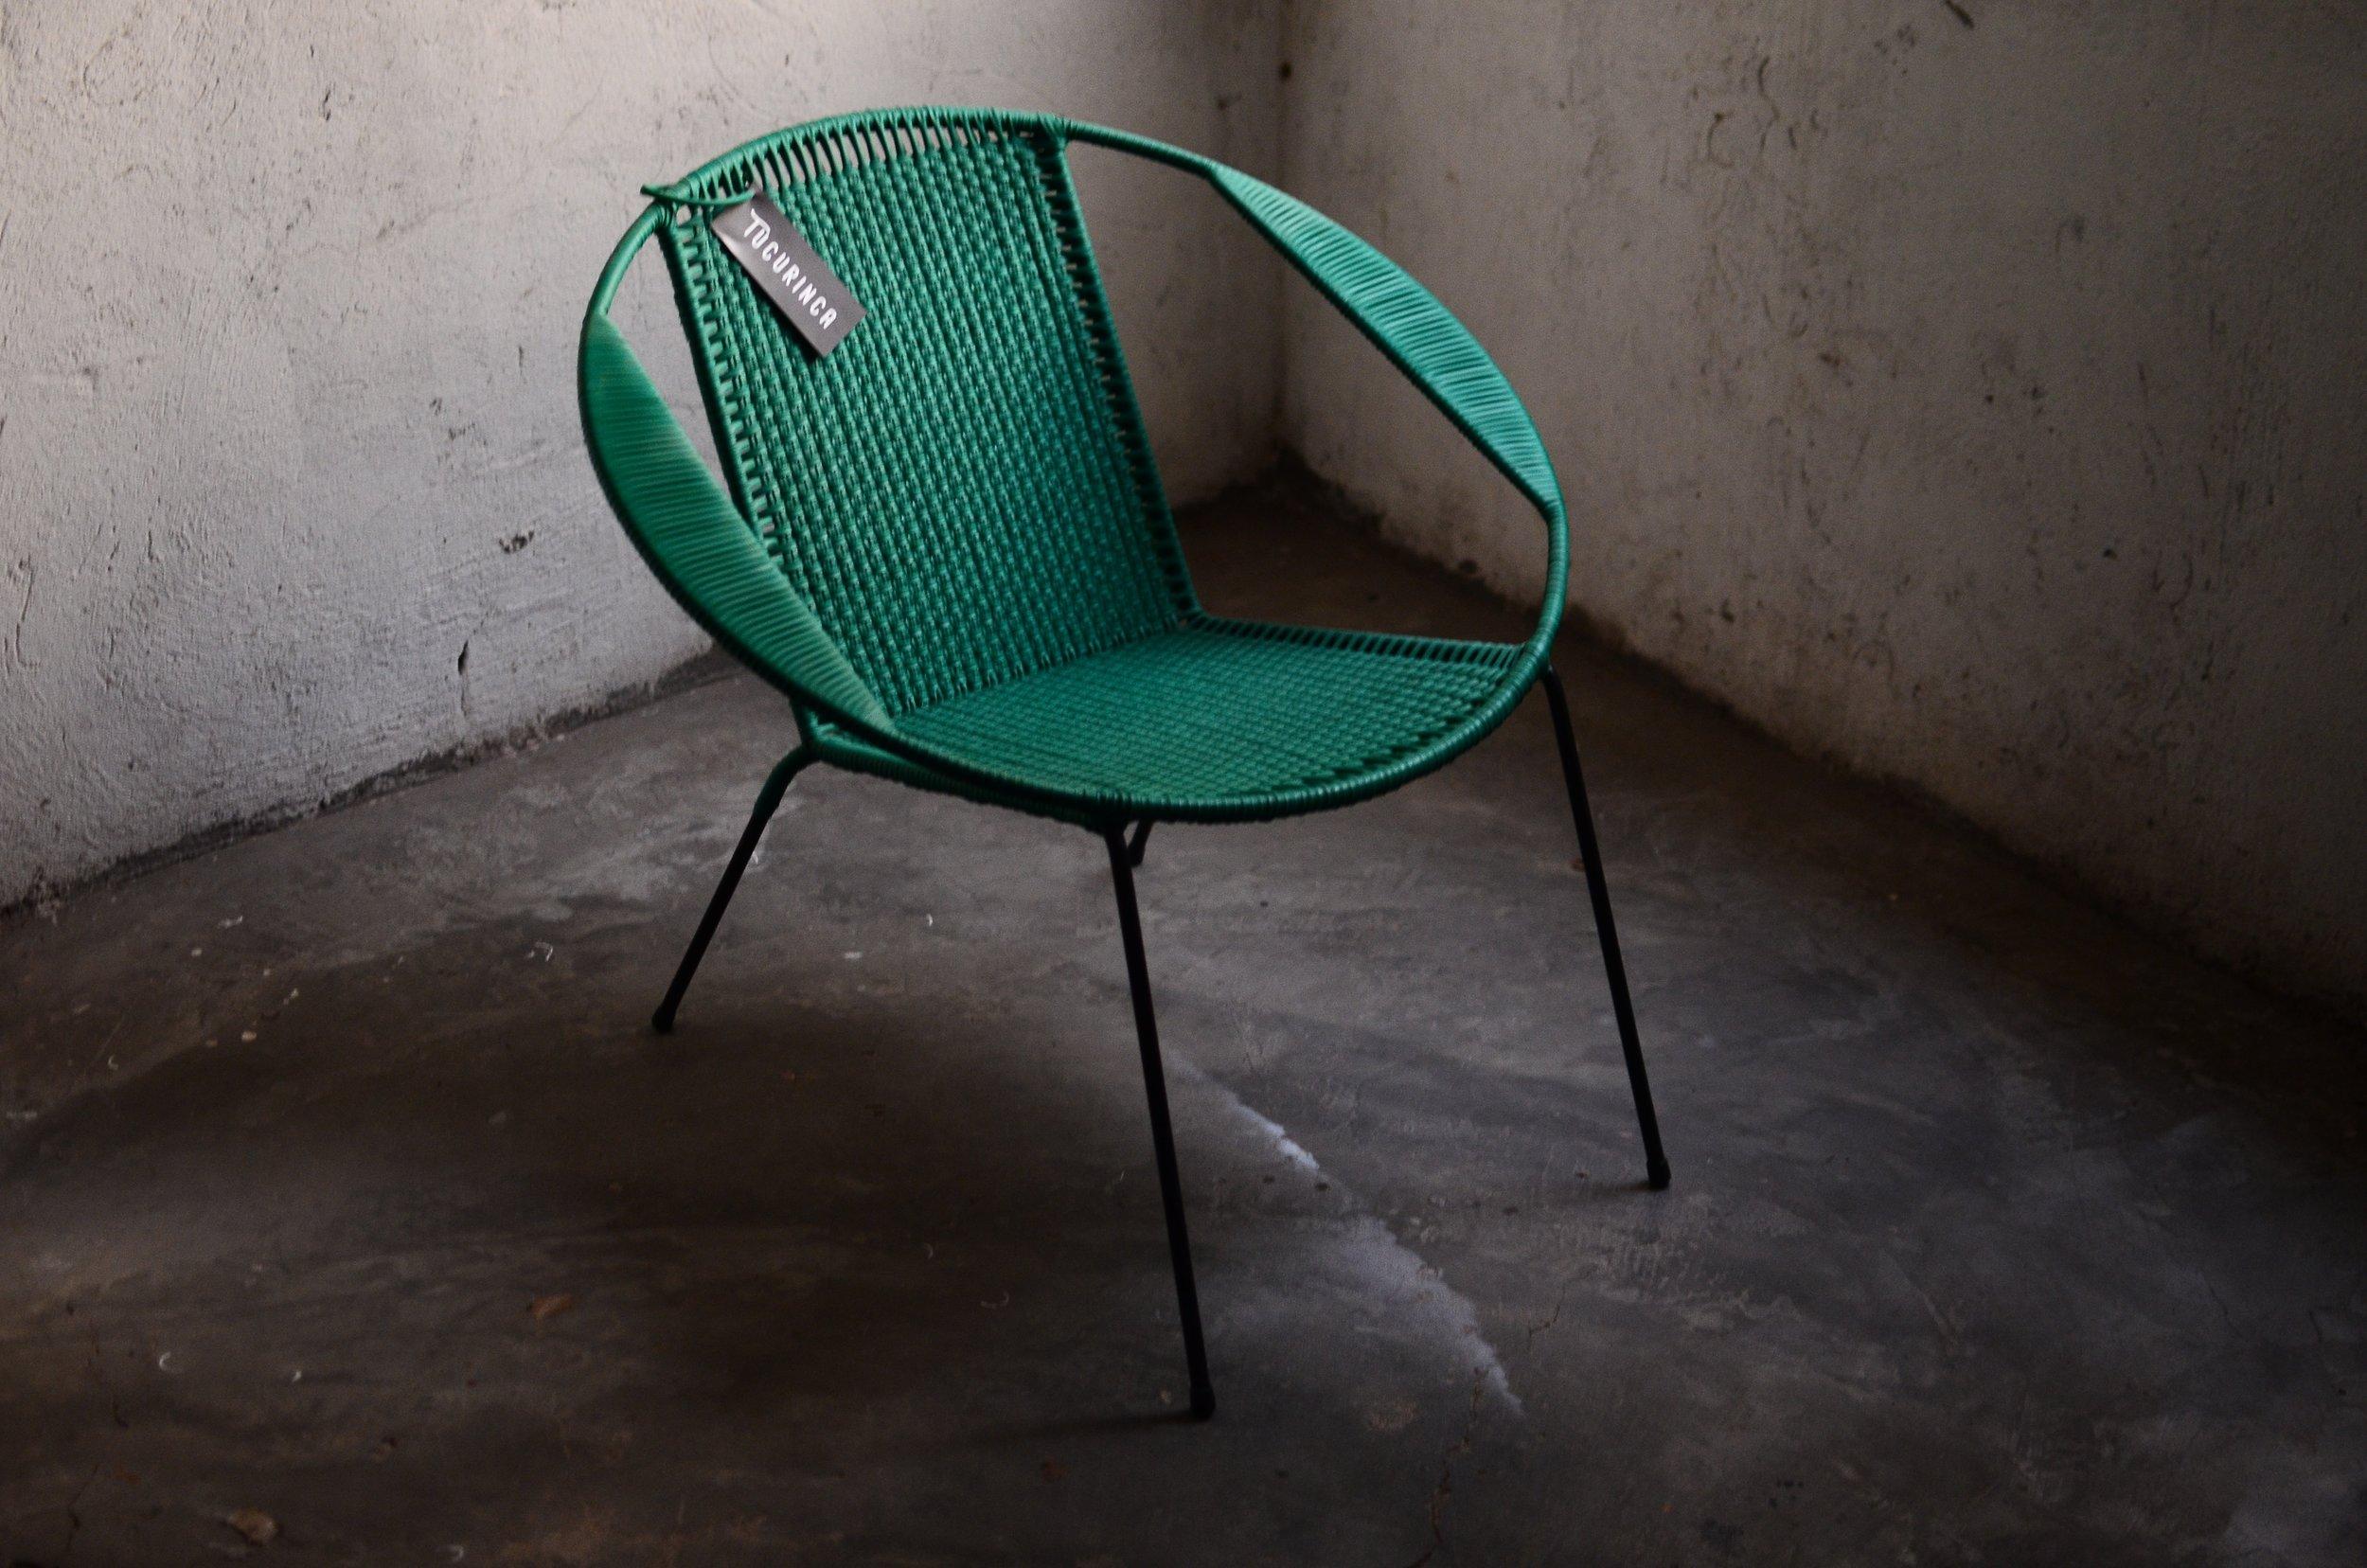 Tucurinca Classic Easy Chair, 385 euro.